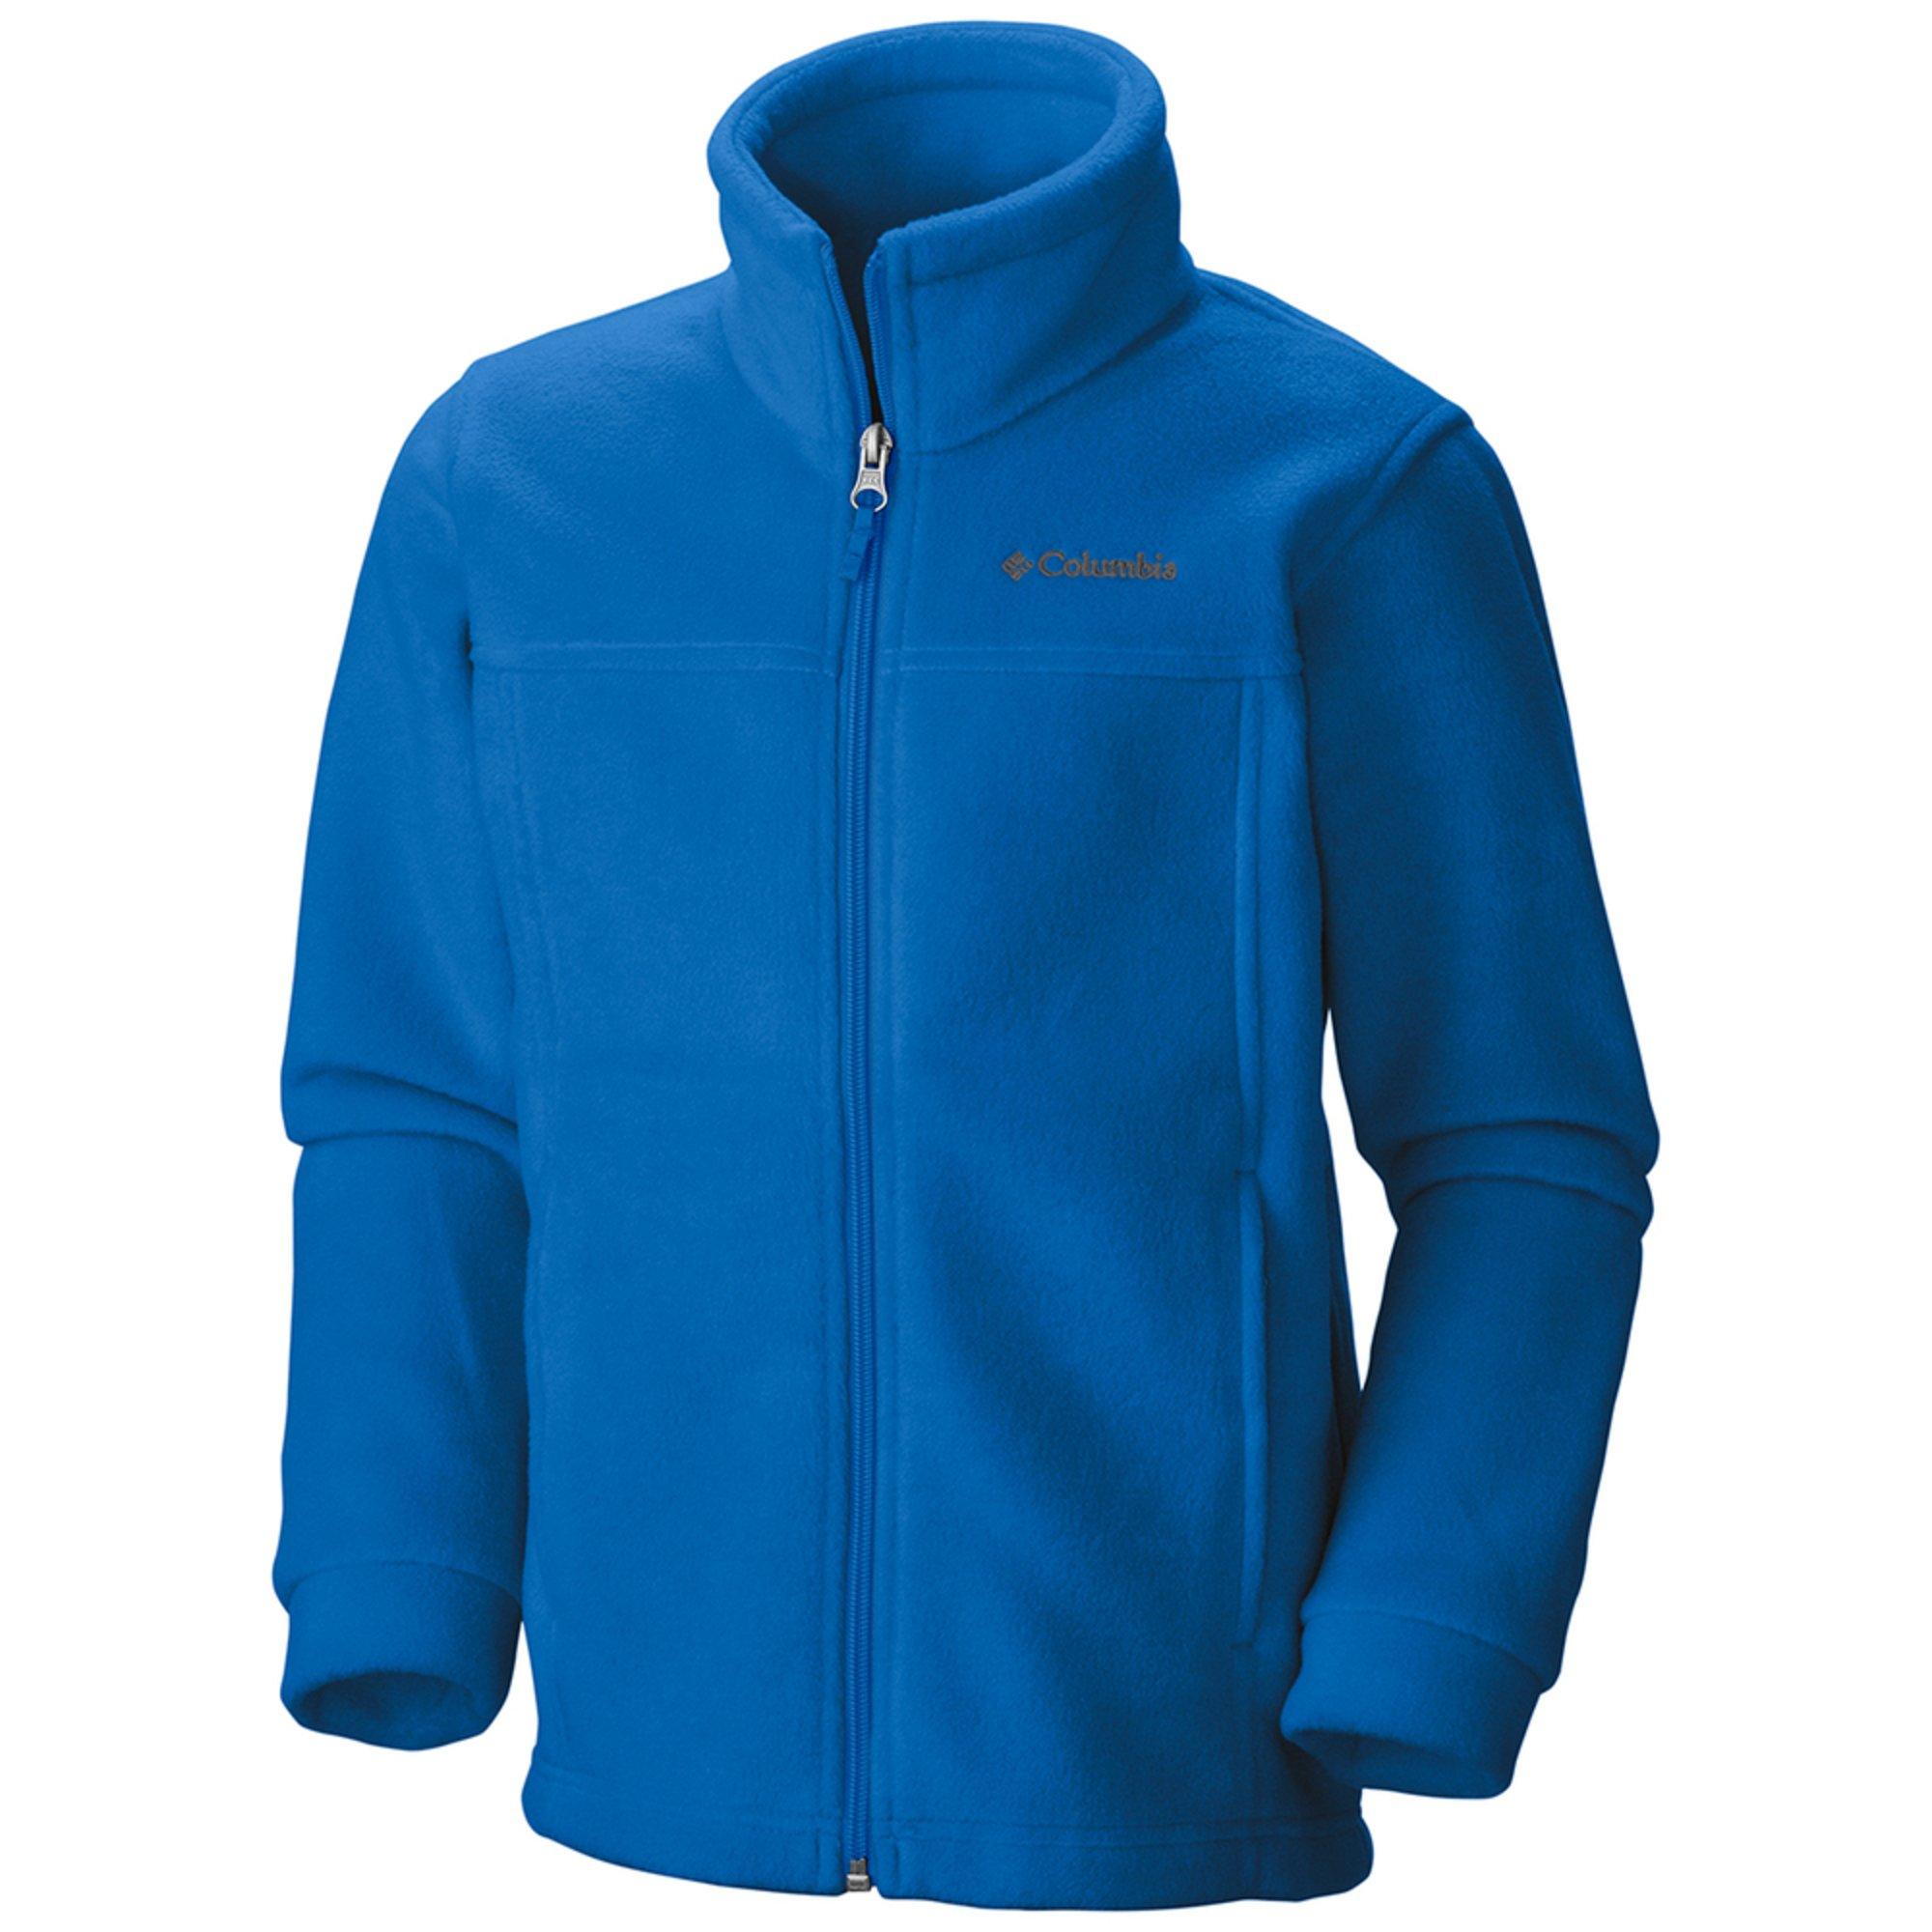 52c1ff172 Columbia Big Boys' Steens Ii Full-zip Fleece Jacket, Super Blue ...